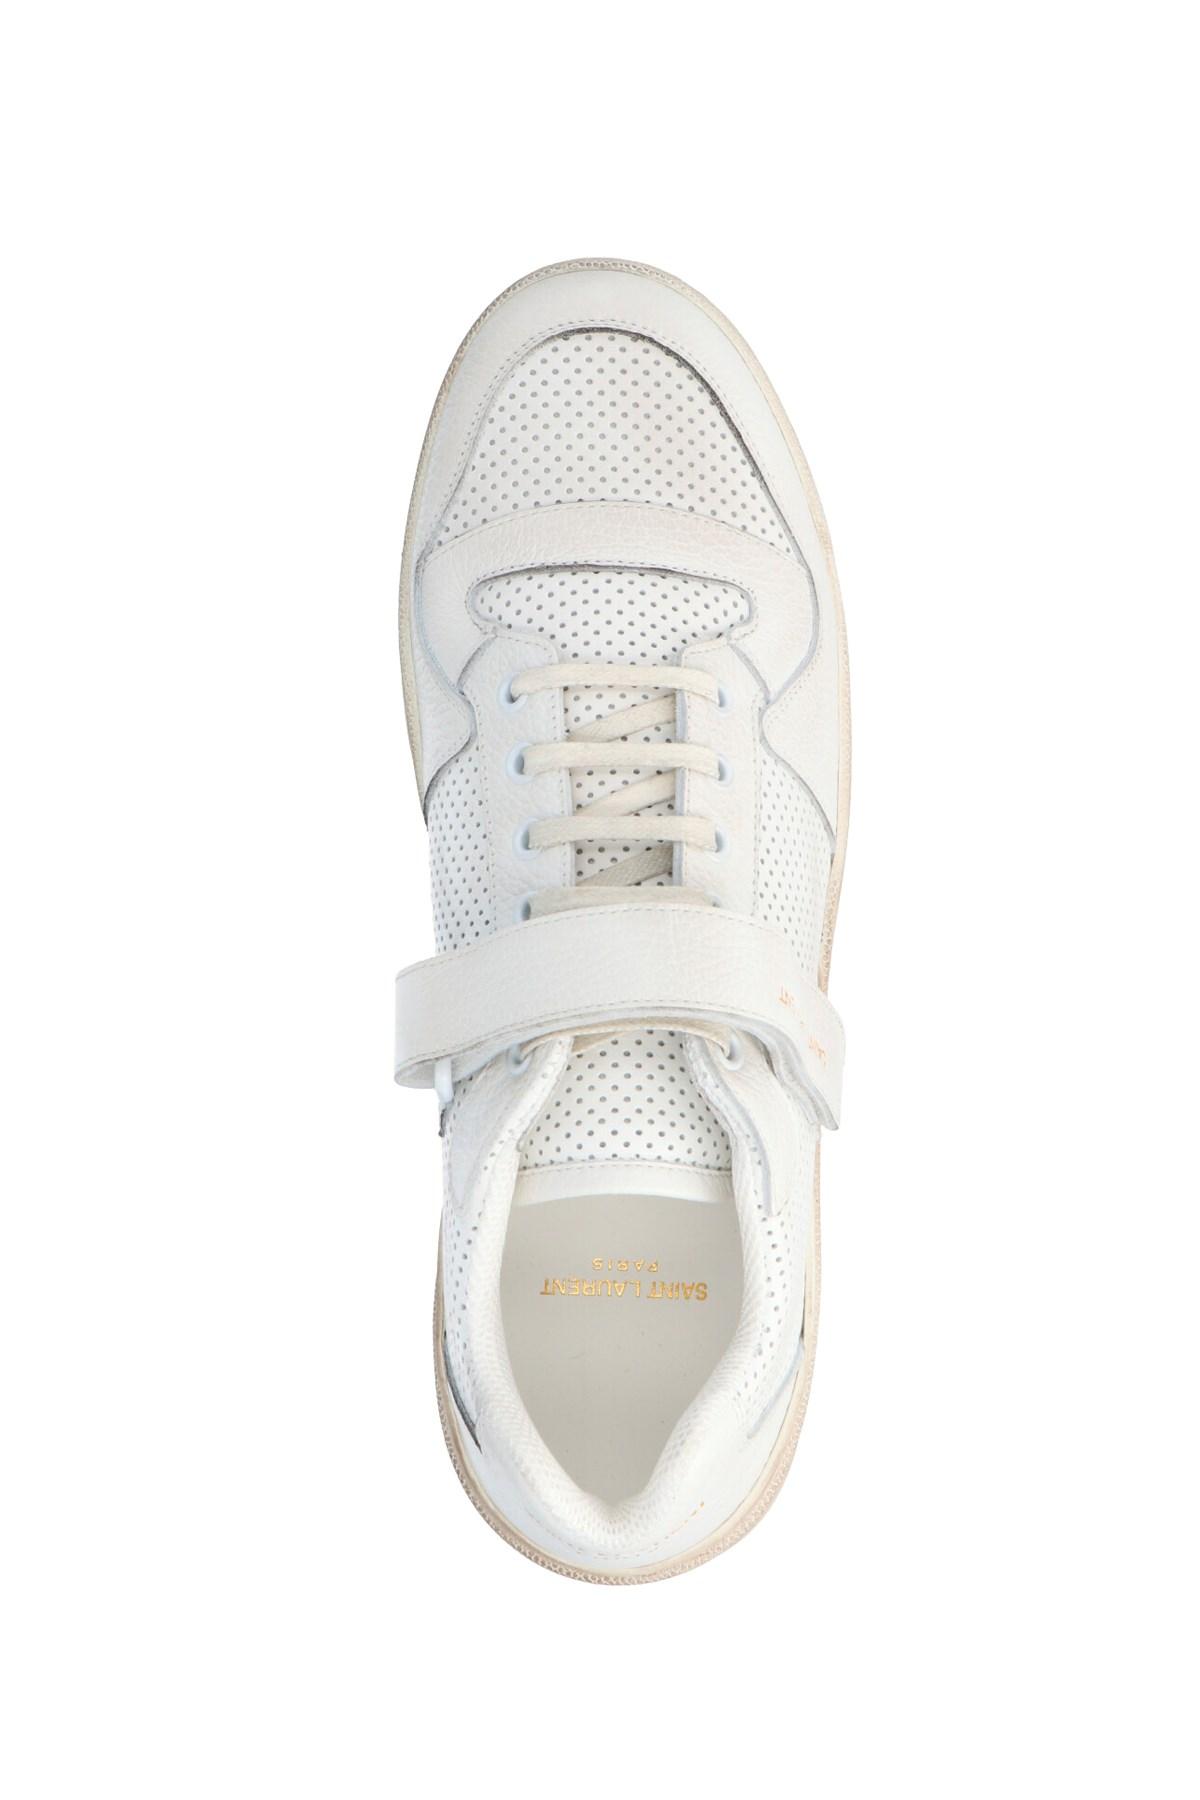 saint laurent 'SL24' sneakers available